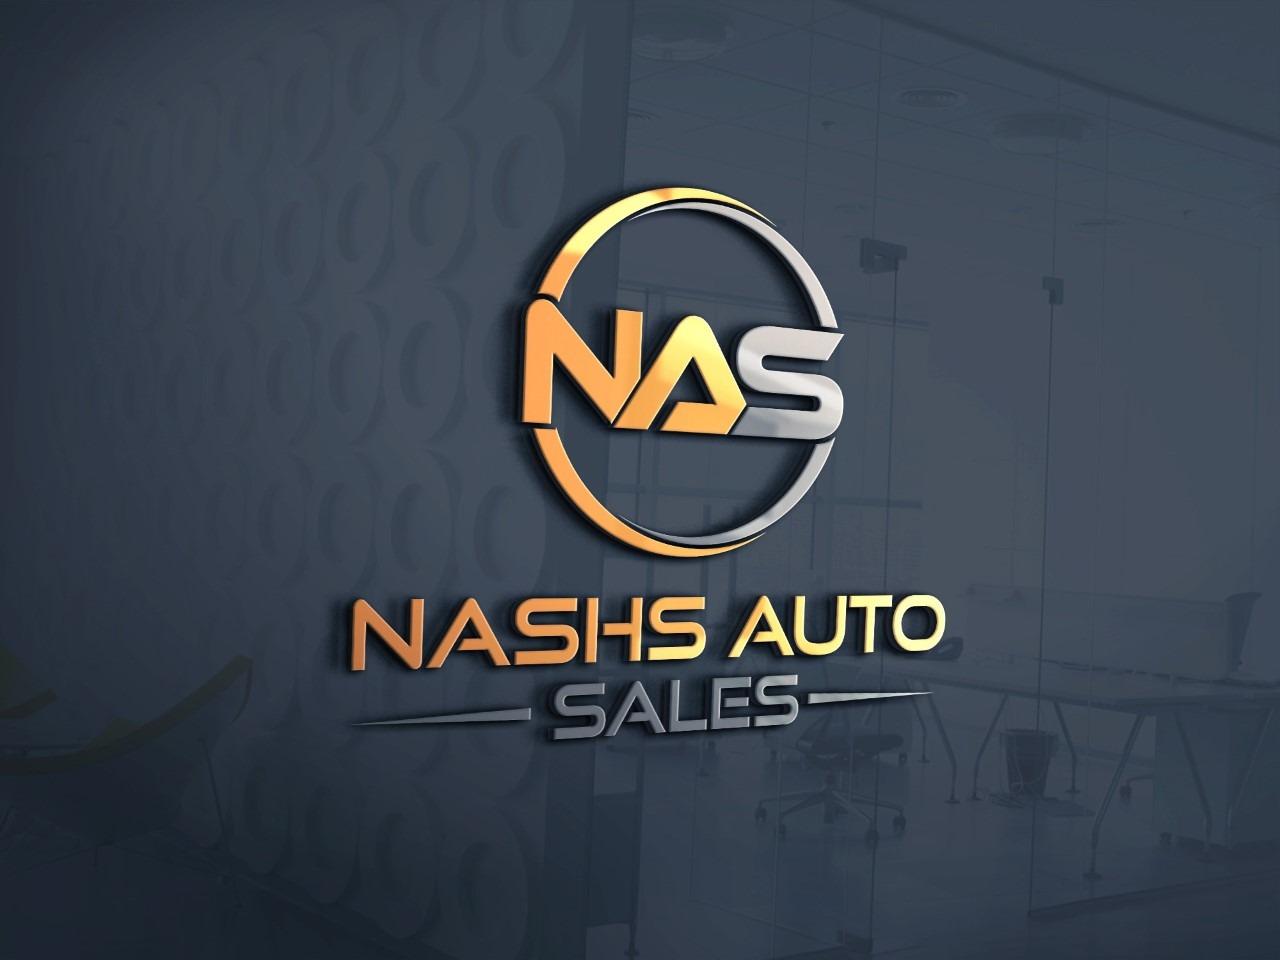 Nash's Auto Sales Used Car Dealer